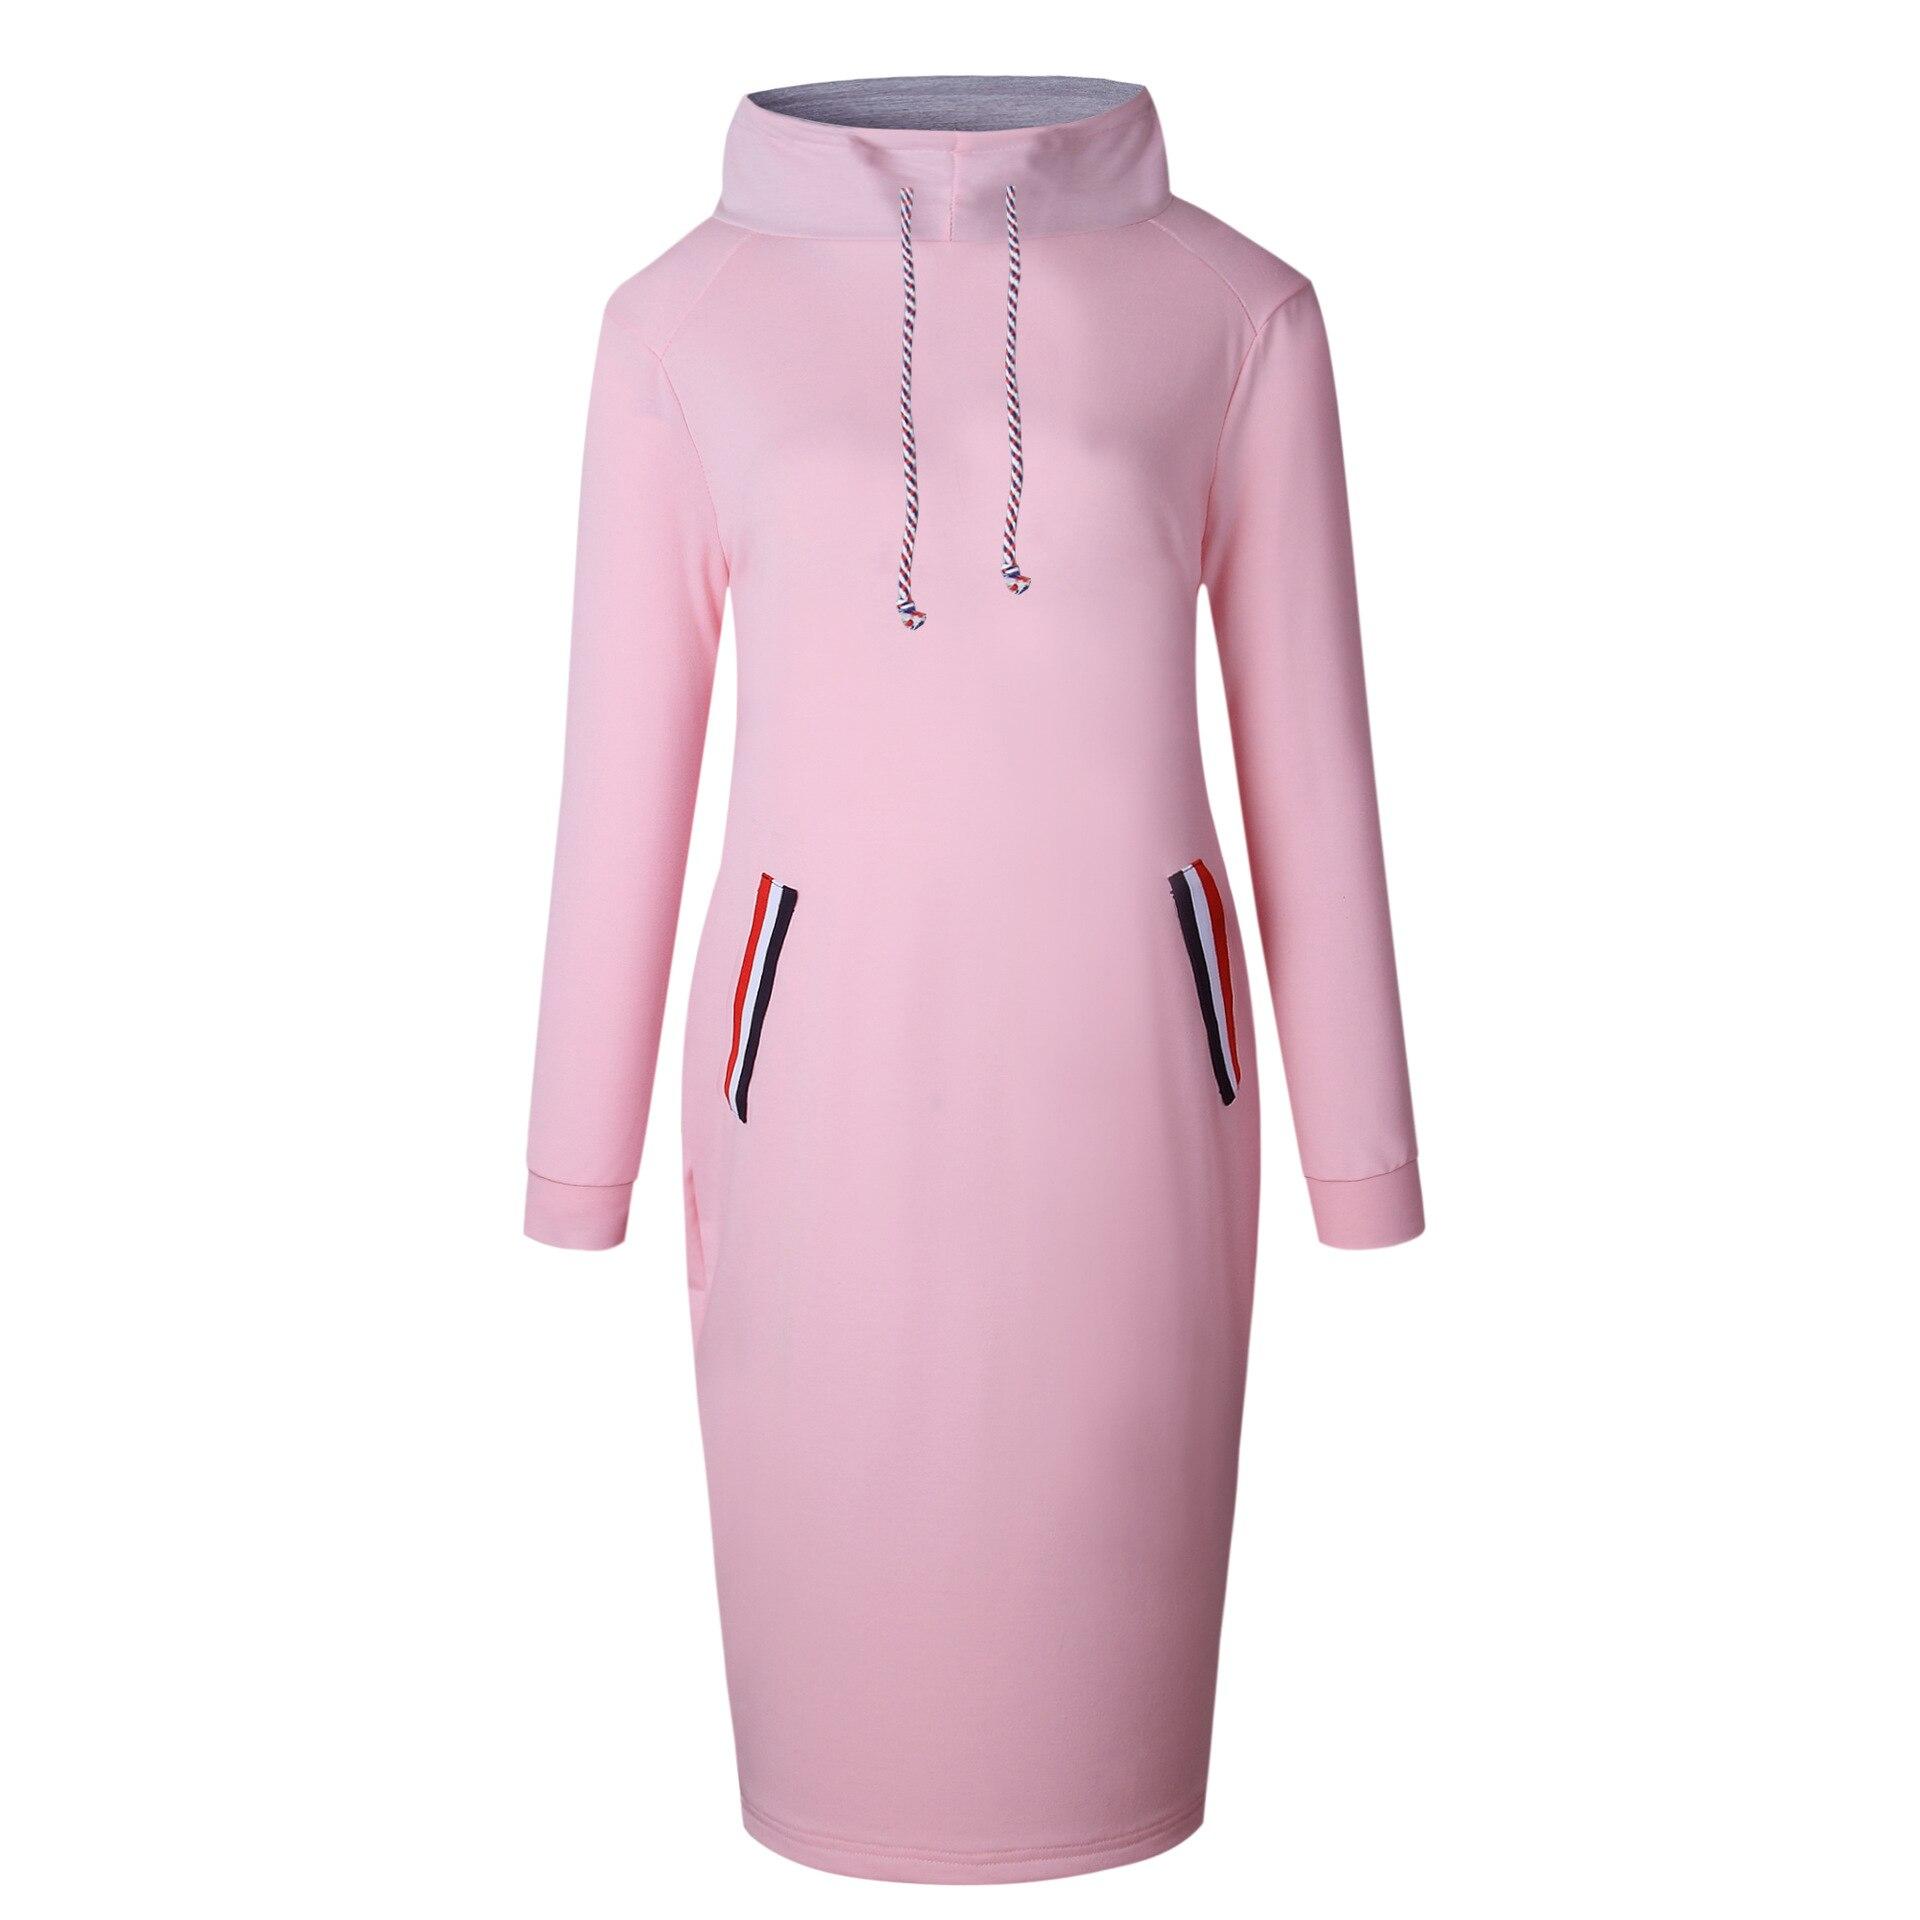 Hoodies Fleece Sweatshirts Coat 2018 Autumn Winter Warm Women Turtleneck Design Long Sleeve With Hood Long Outerwear Plus Size